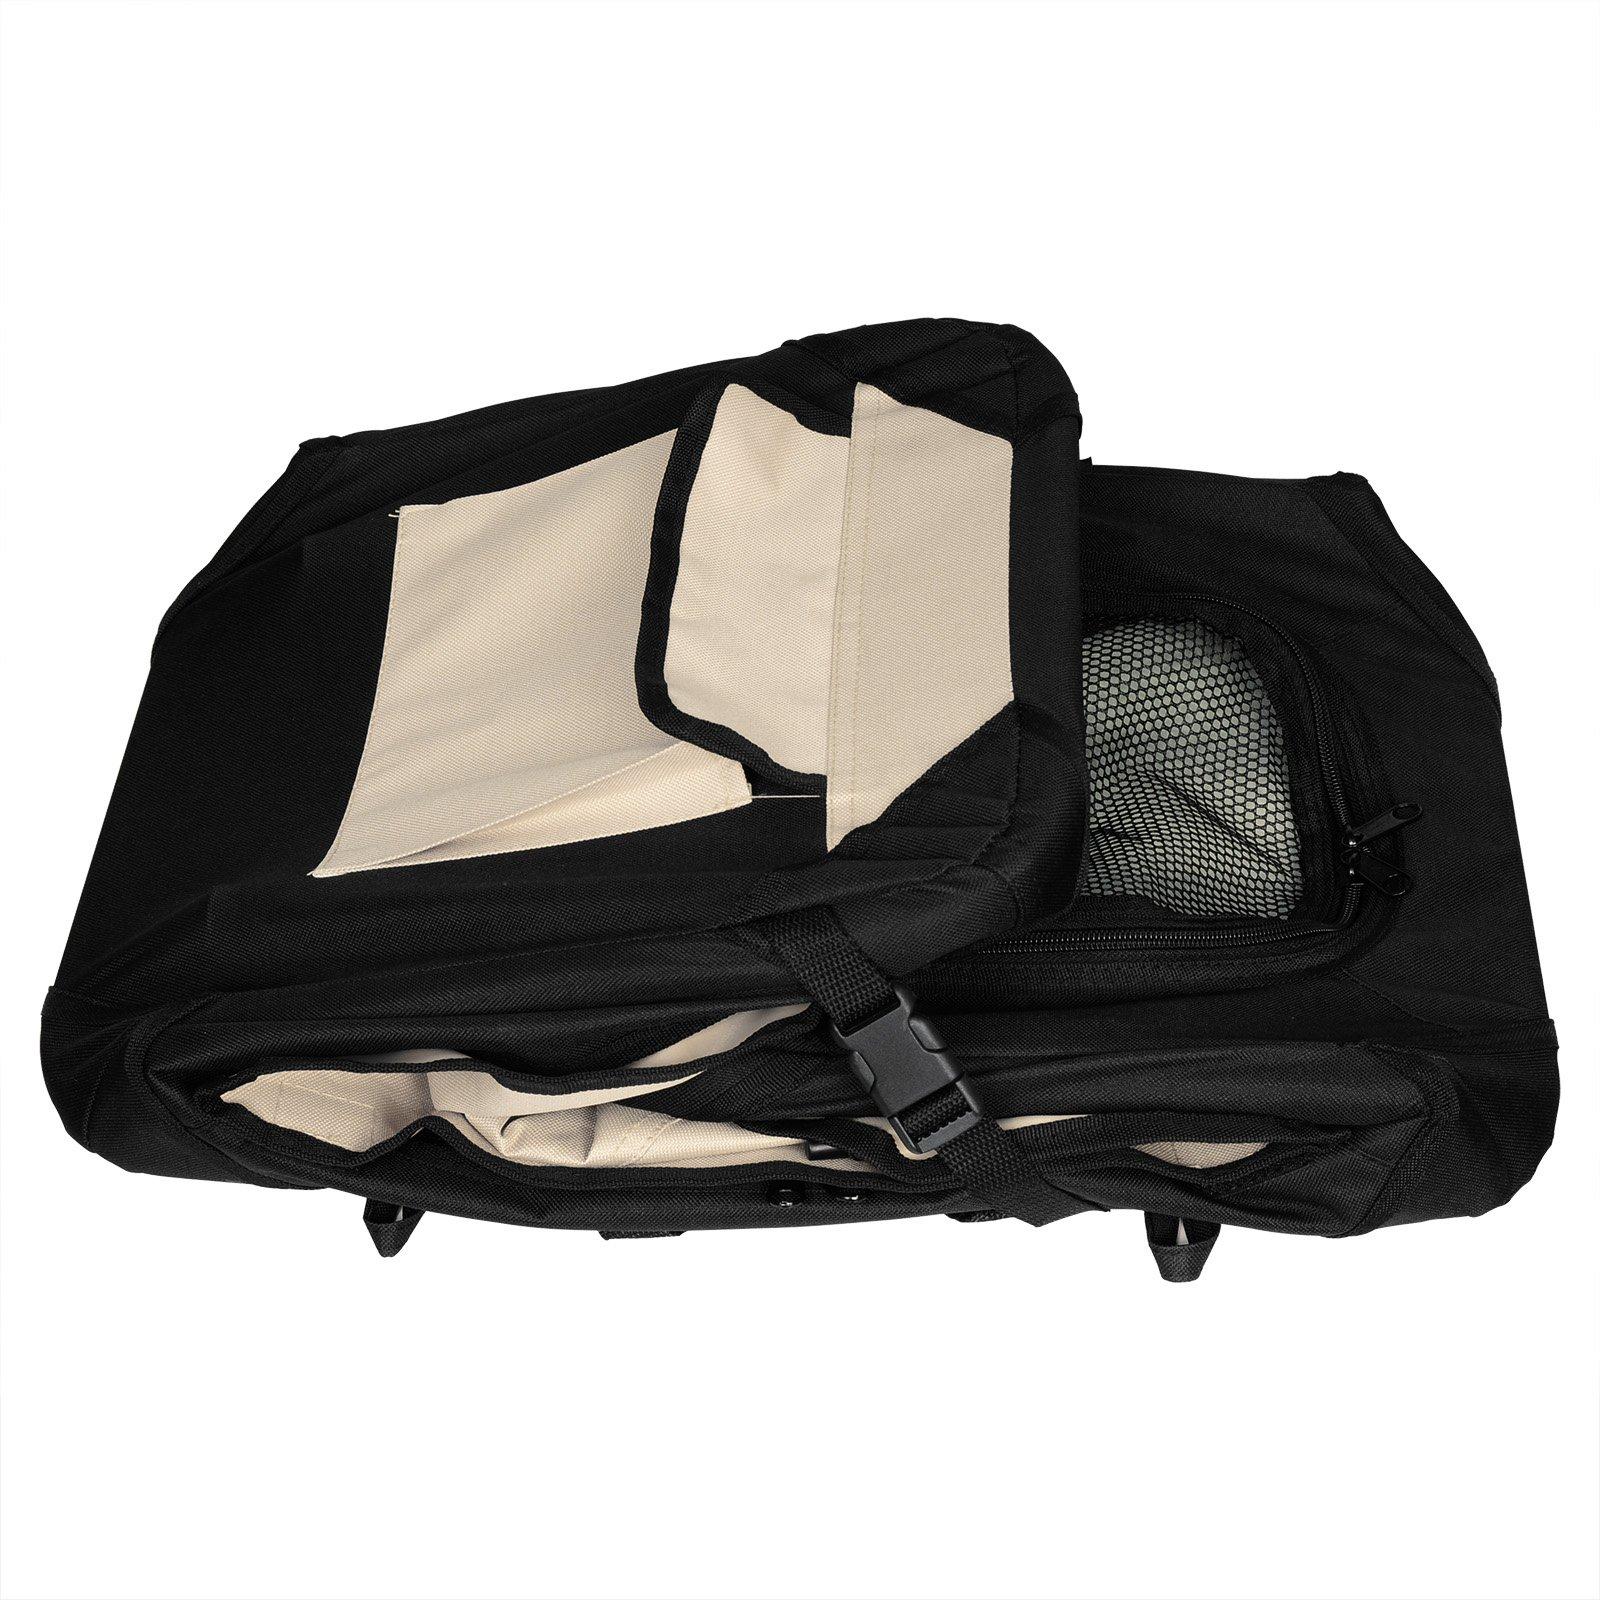 WOLTU Premium Soft Sided Pet Carrier Foldable Pet Travel Crate, Black+Beige, PCS01blkS4-a by WOLTU (Image #5)